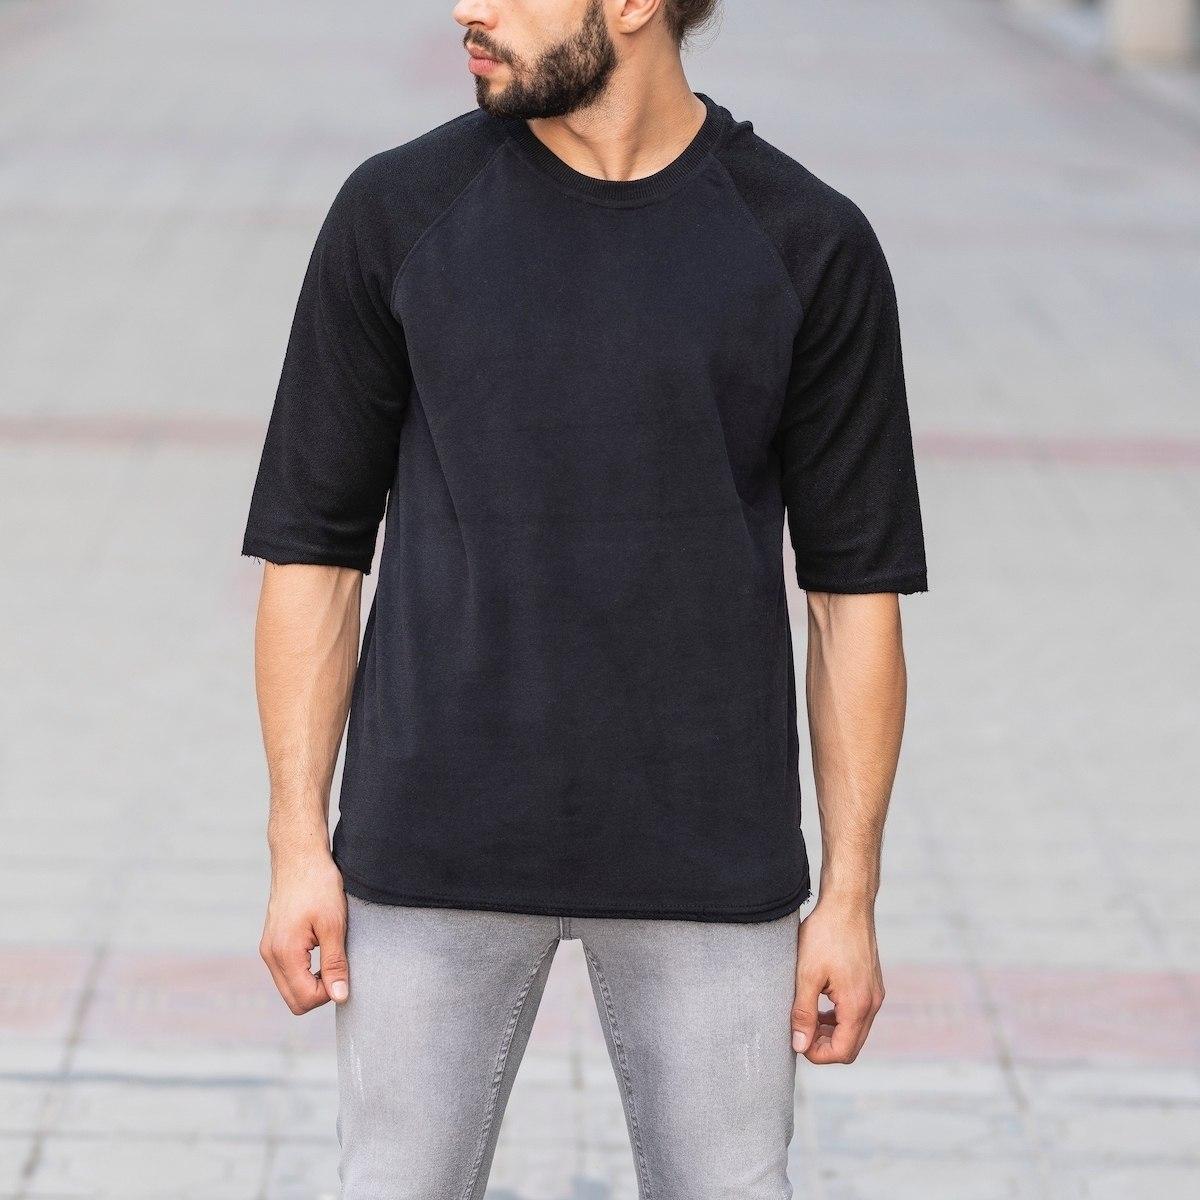 Half Sleeved Black Sweatshirt